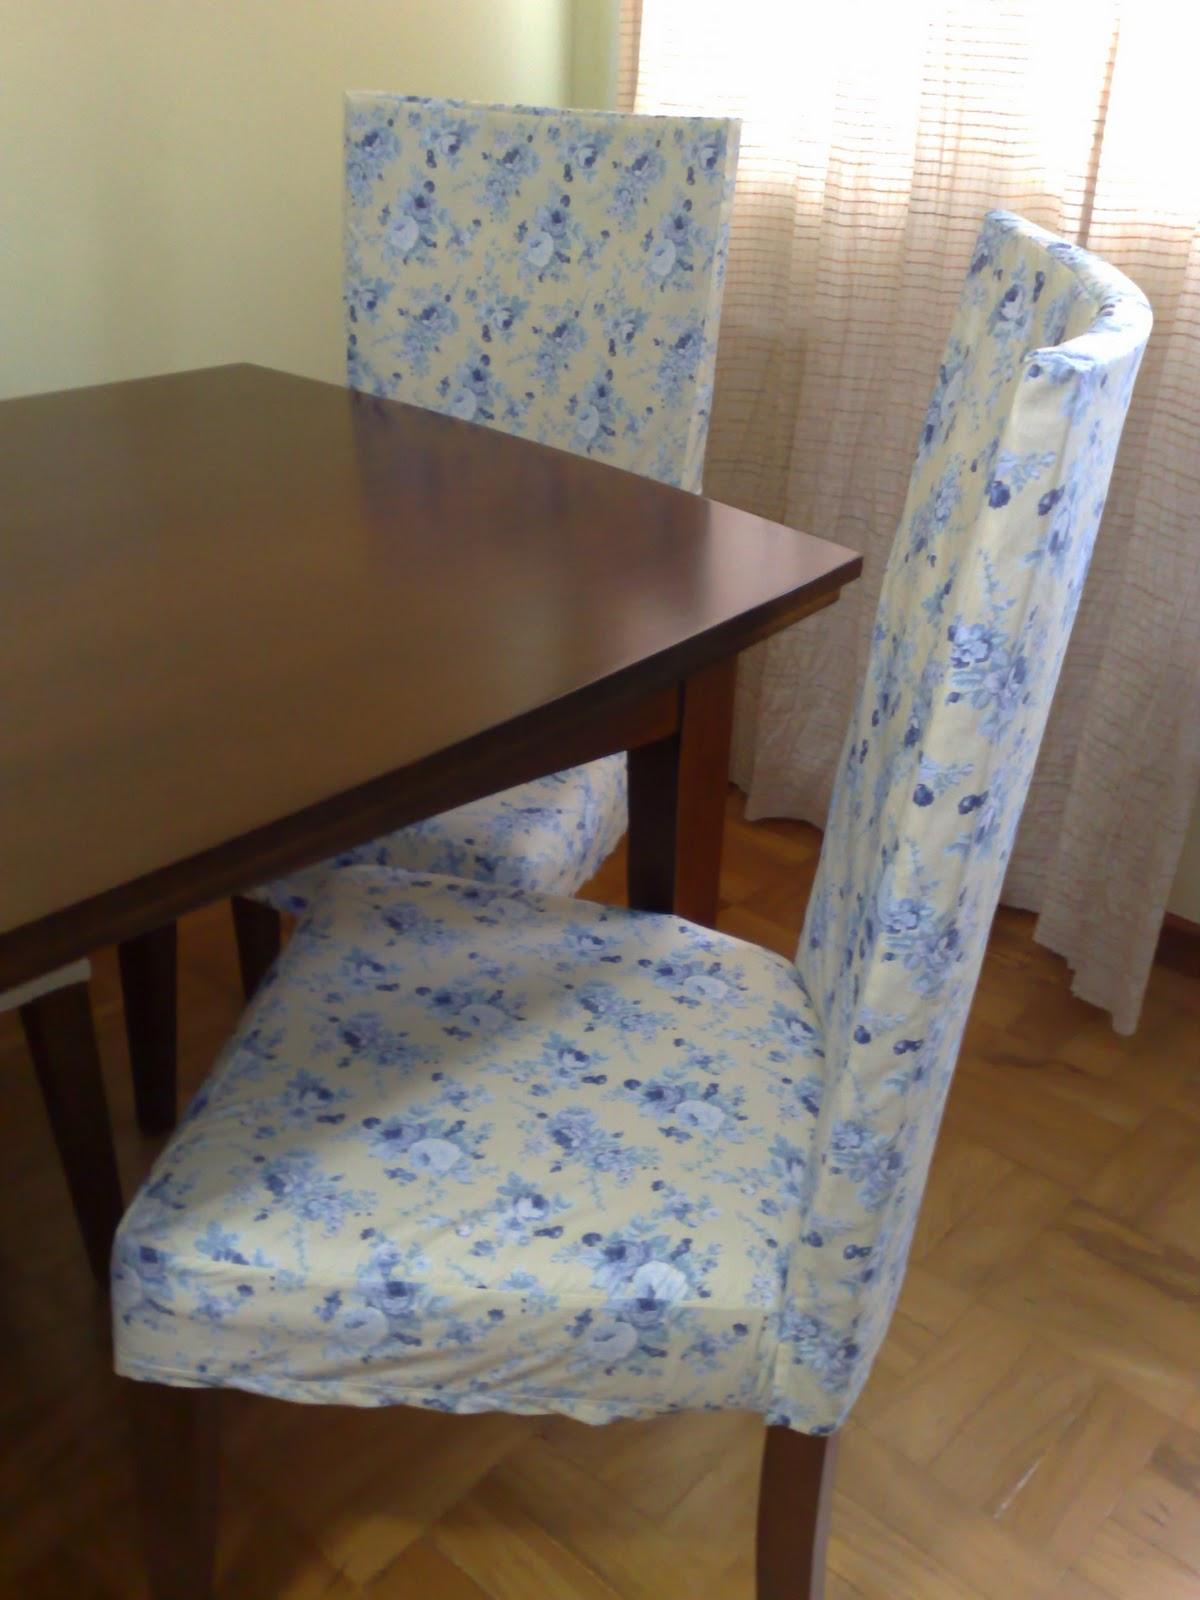 de 15 de novembro aproveitei para costurar capas para seis cadeiras  #342014 1200x1600